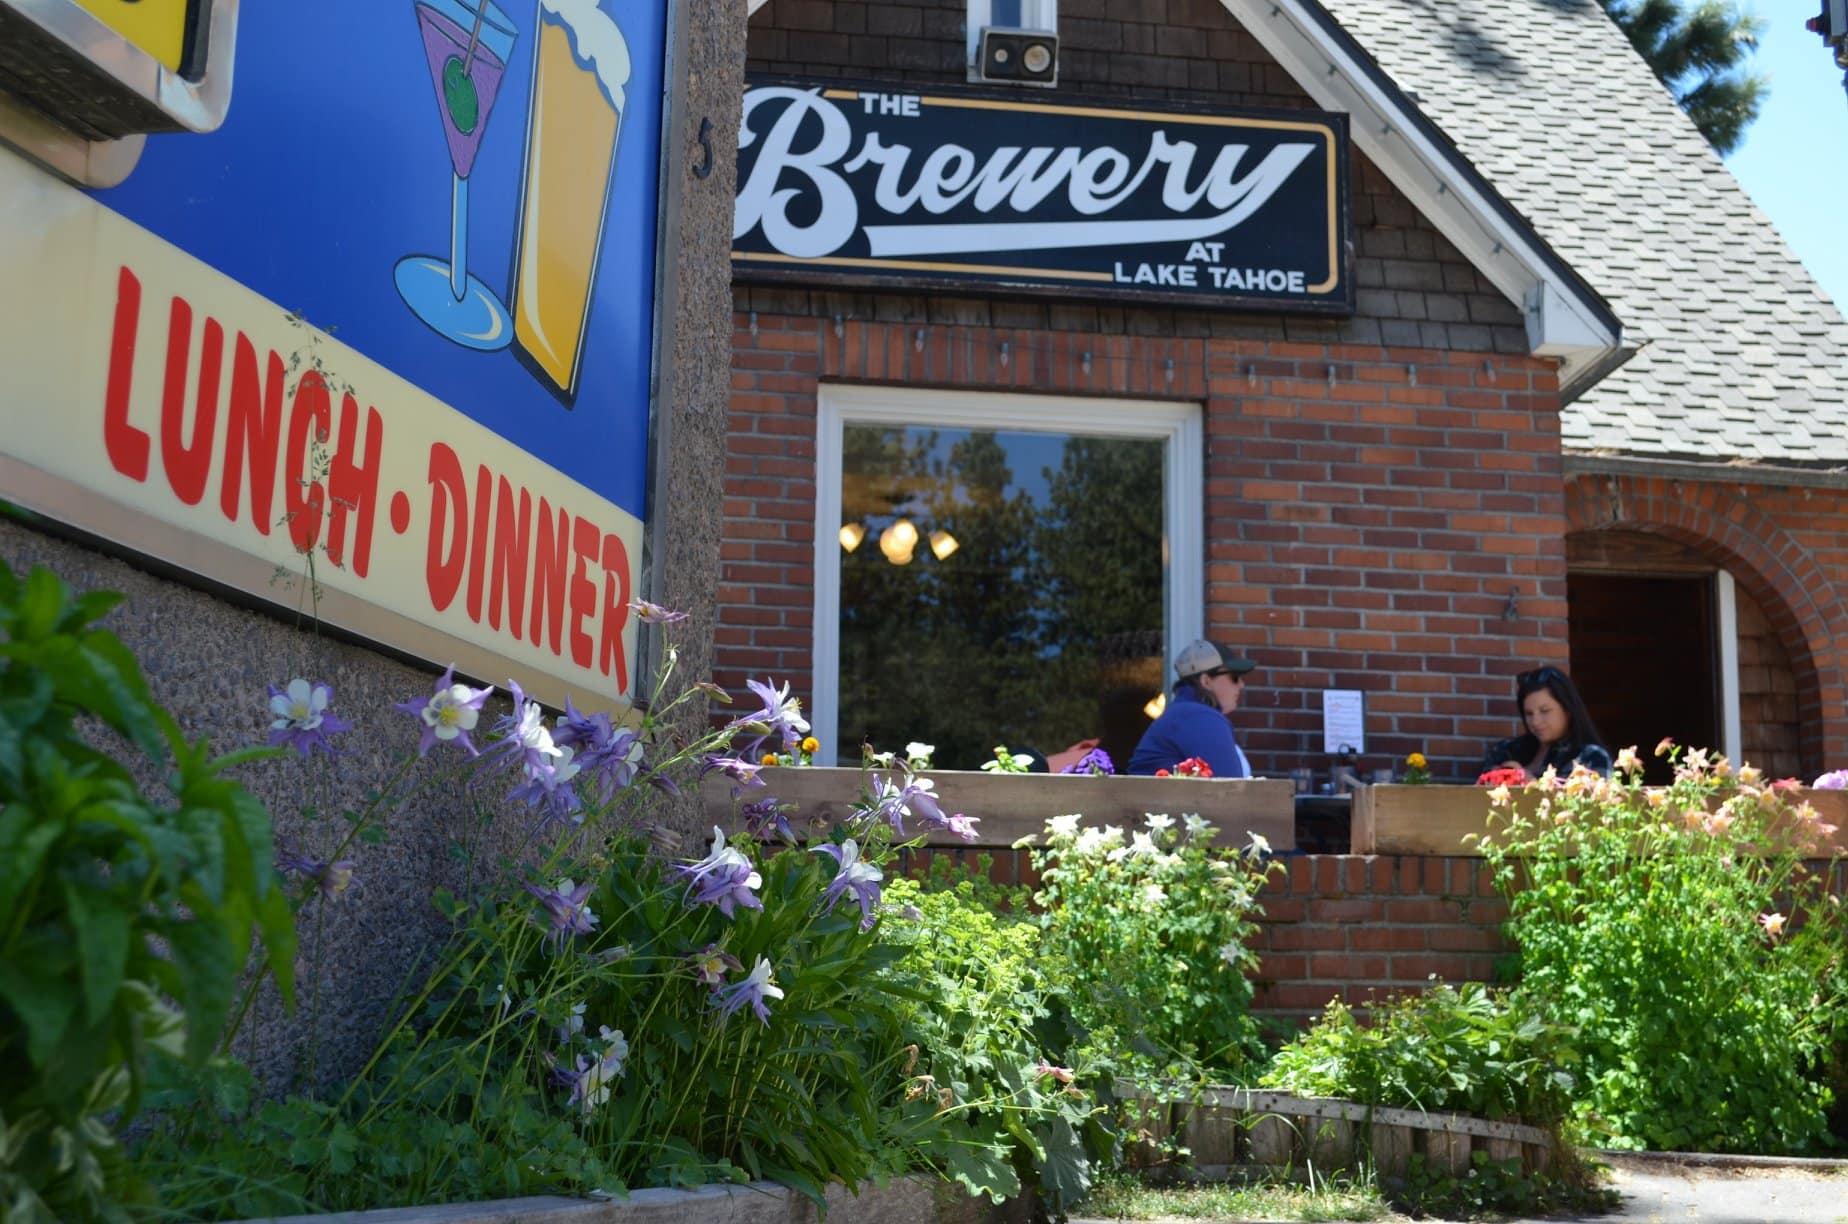 The Brewery, Lake Tahoe